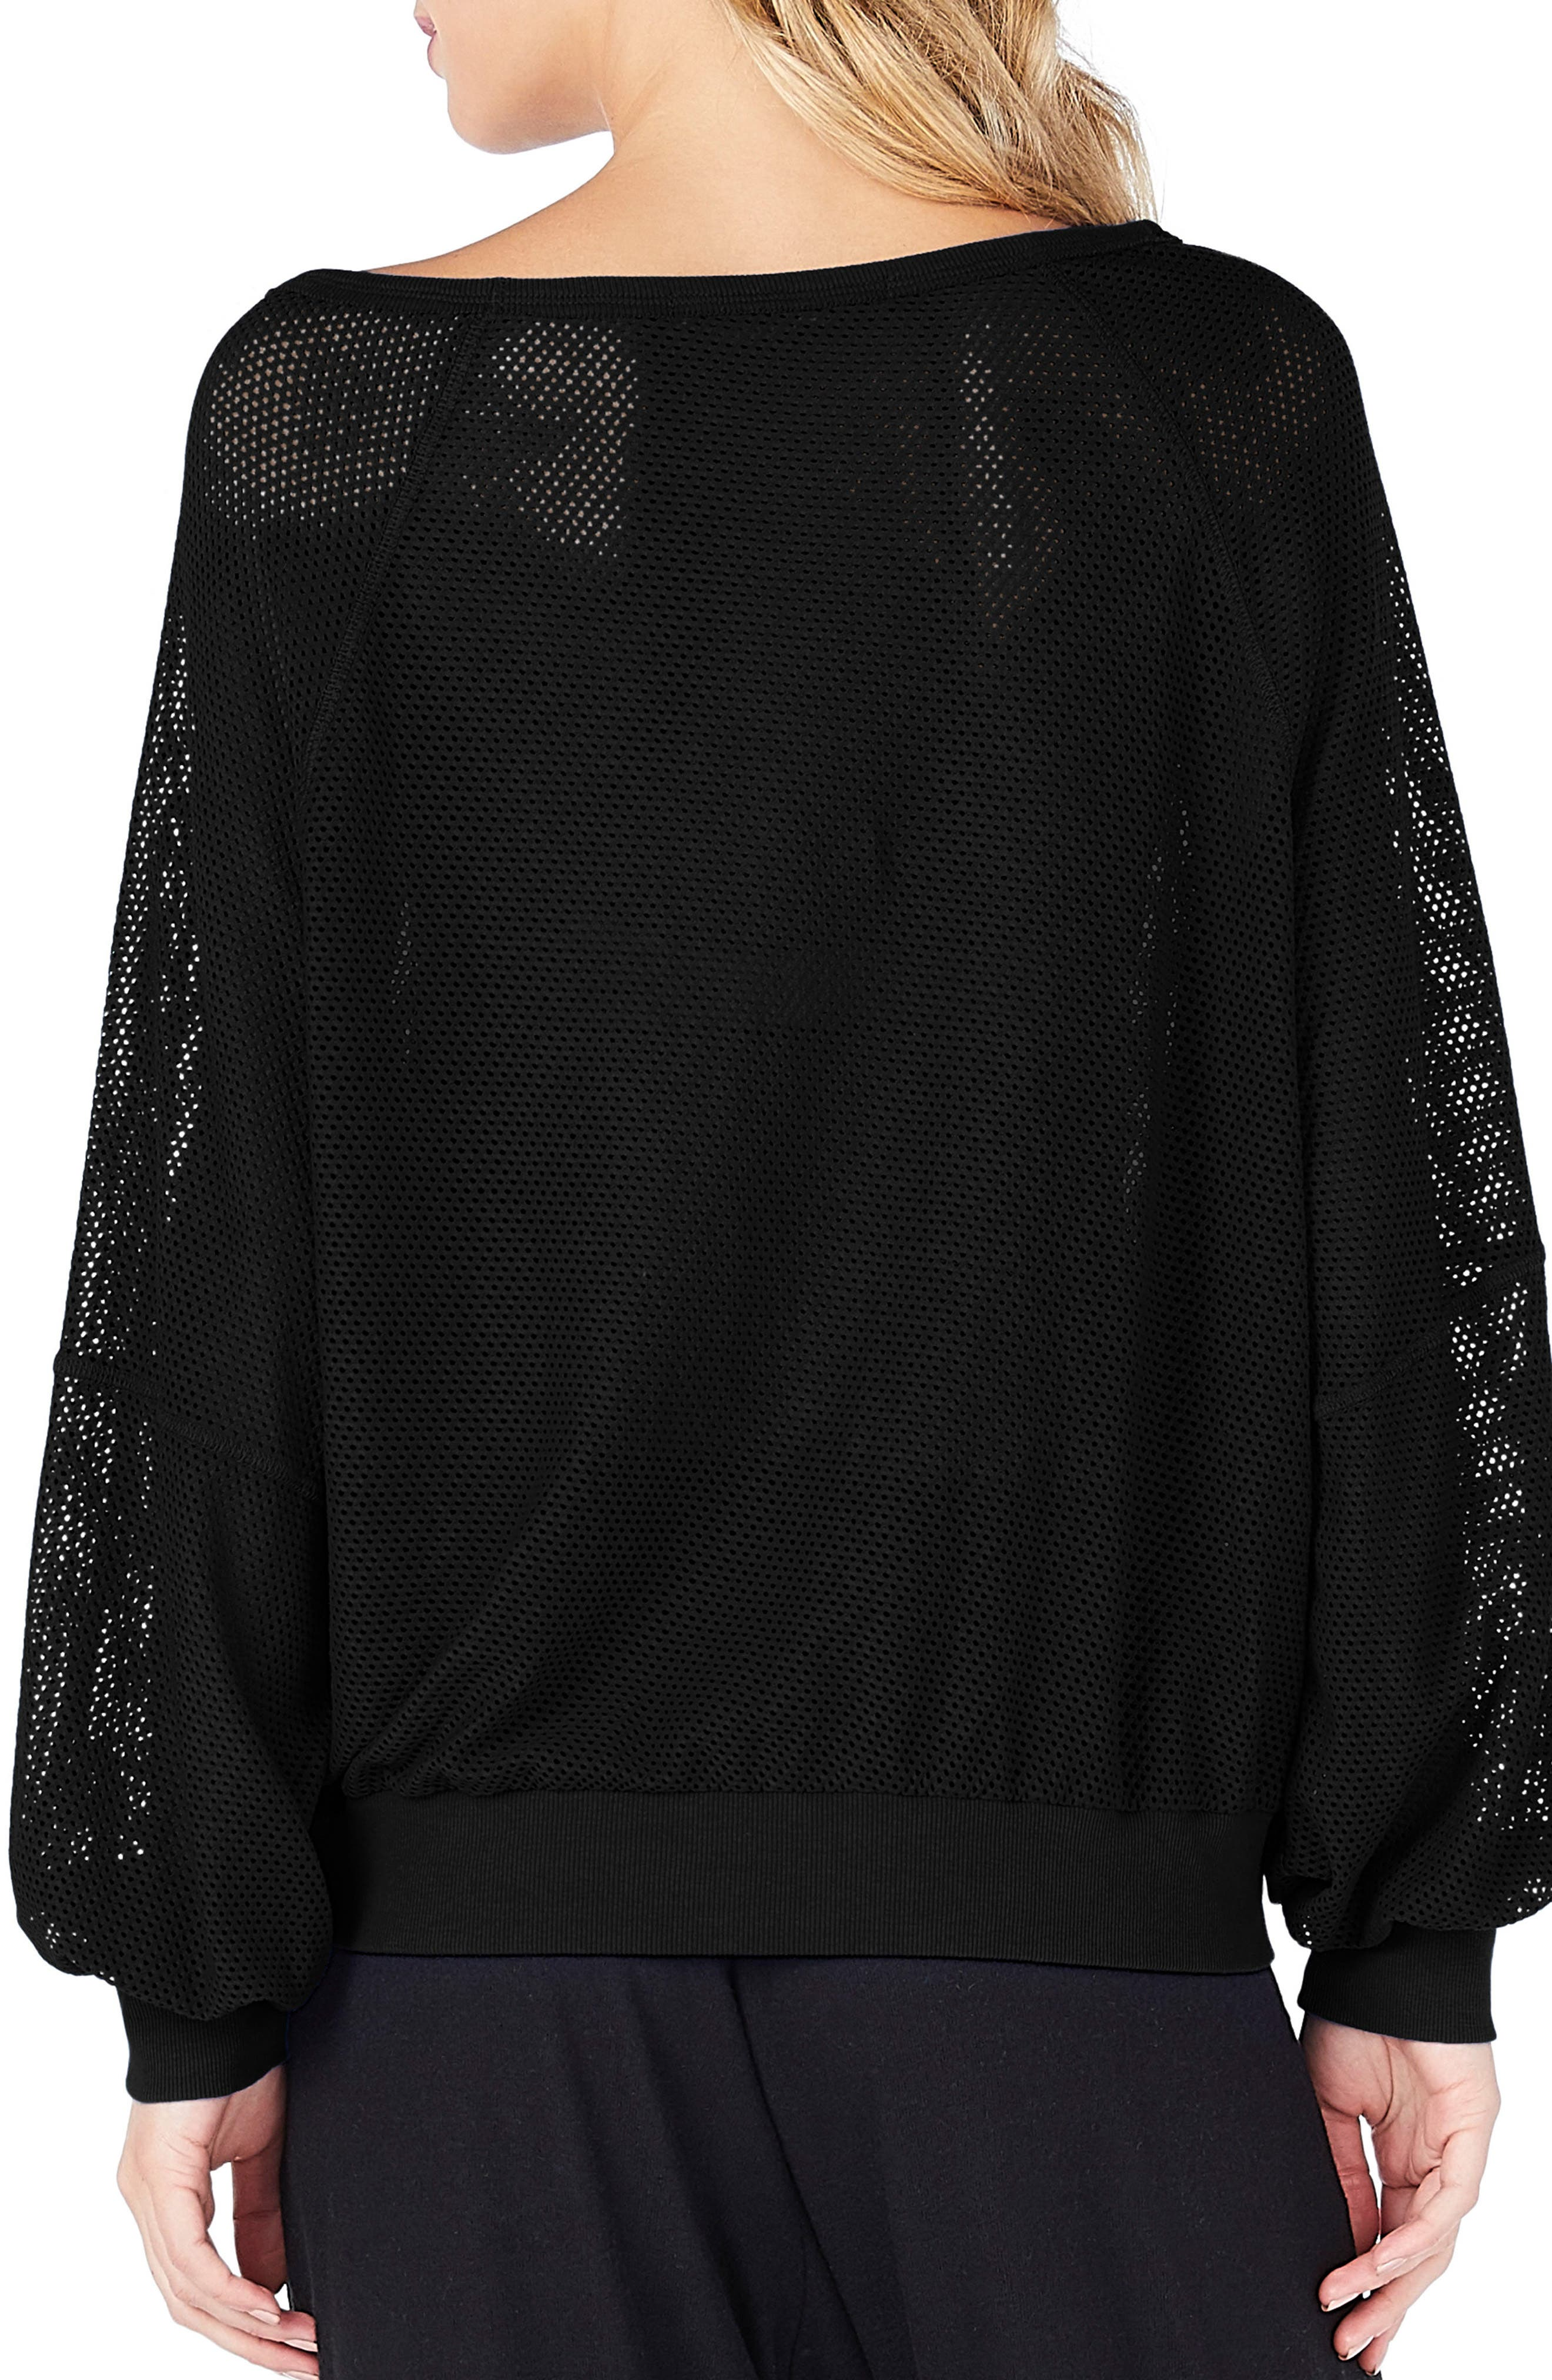 Open Stitch Sweatshirt,                             Alternate thumbnail 2, color,                             001